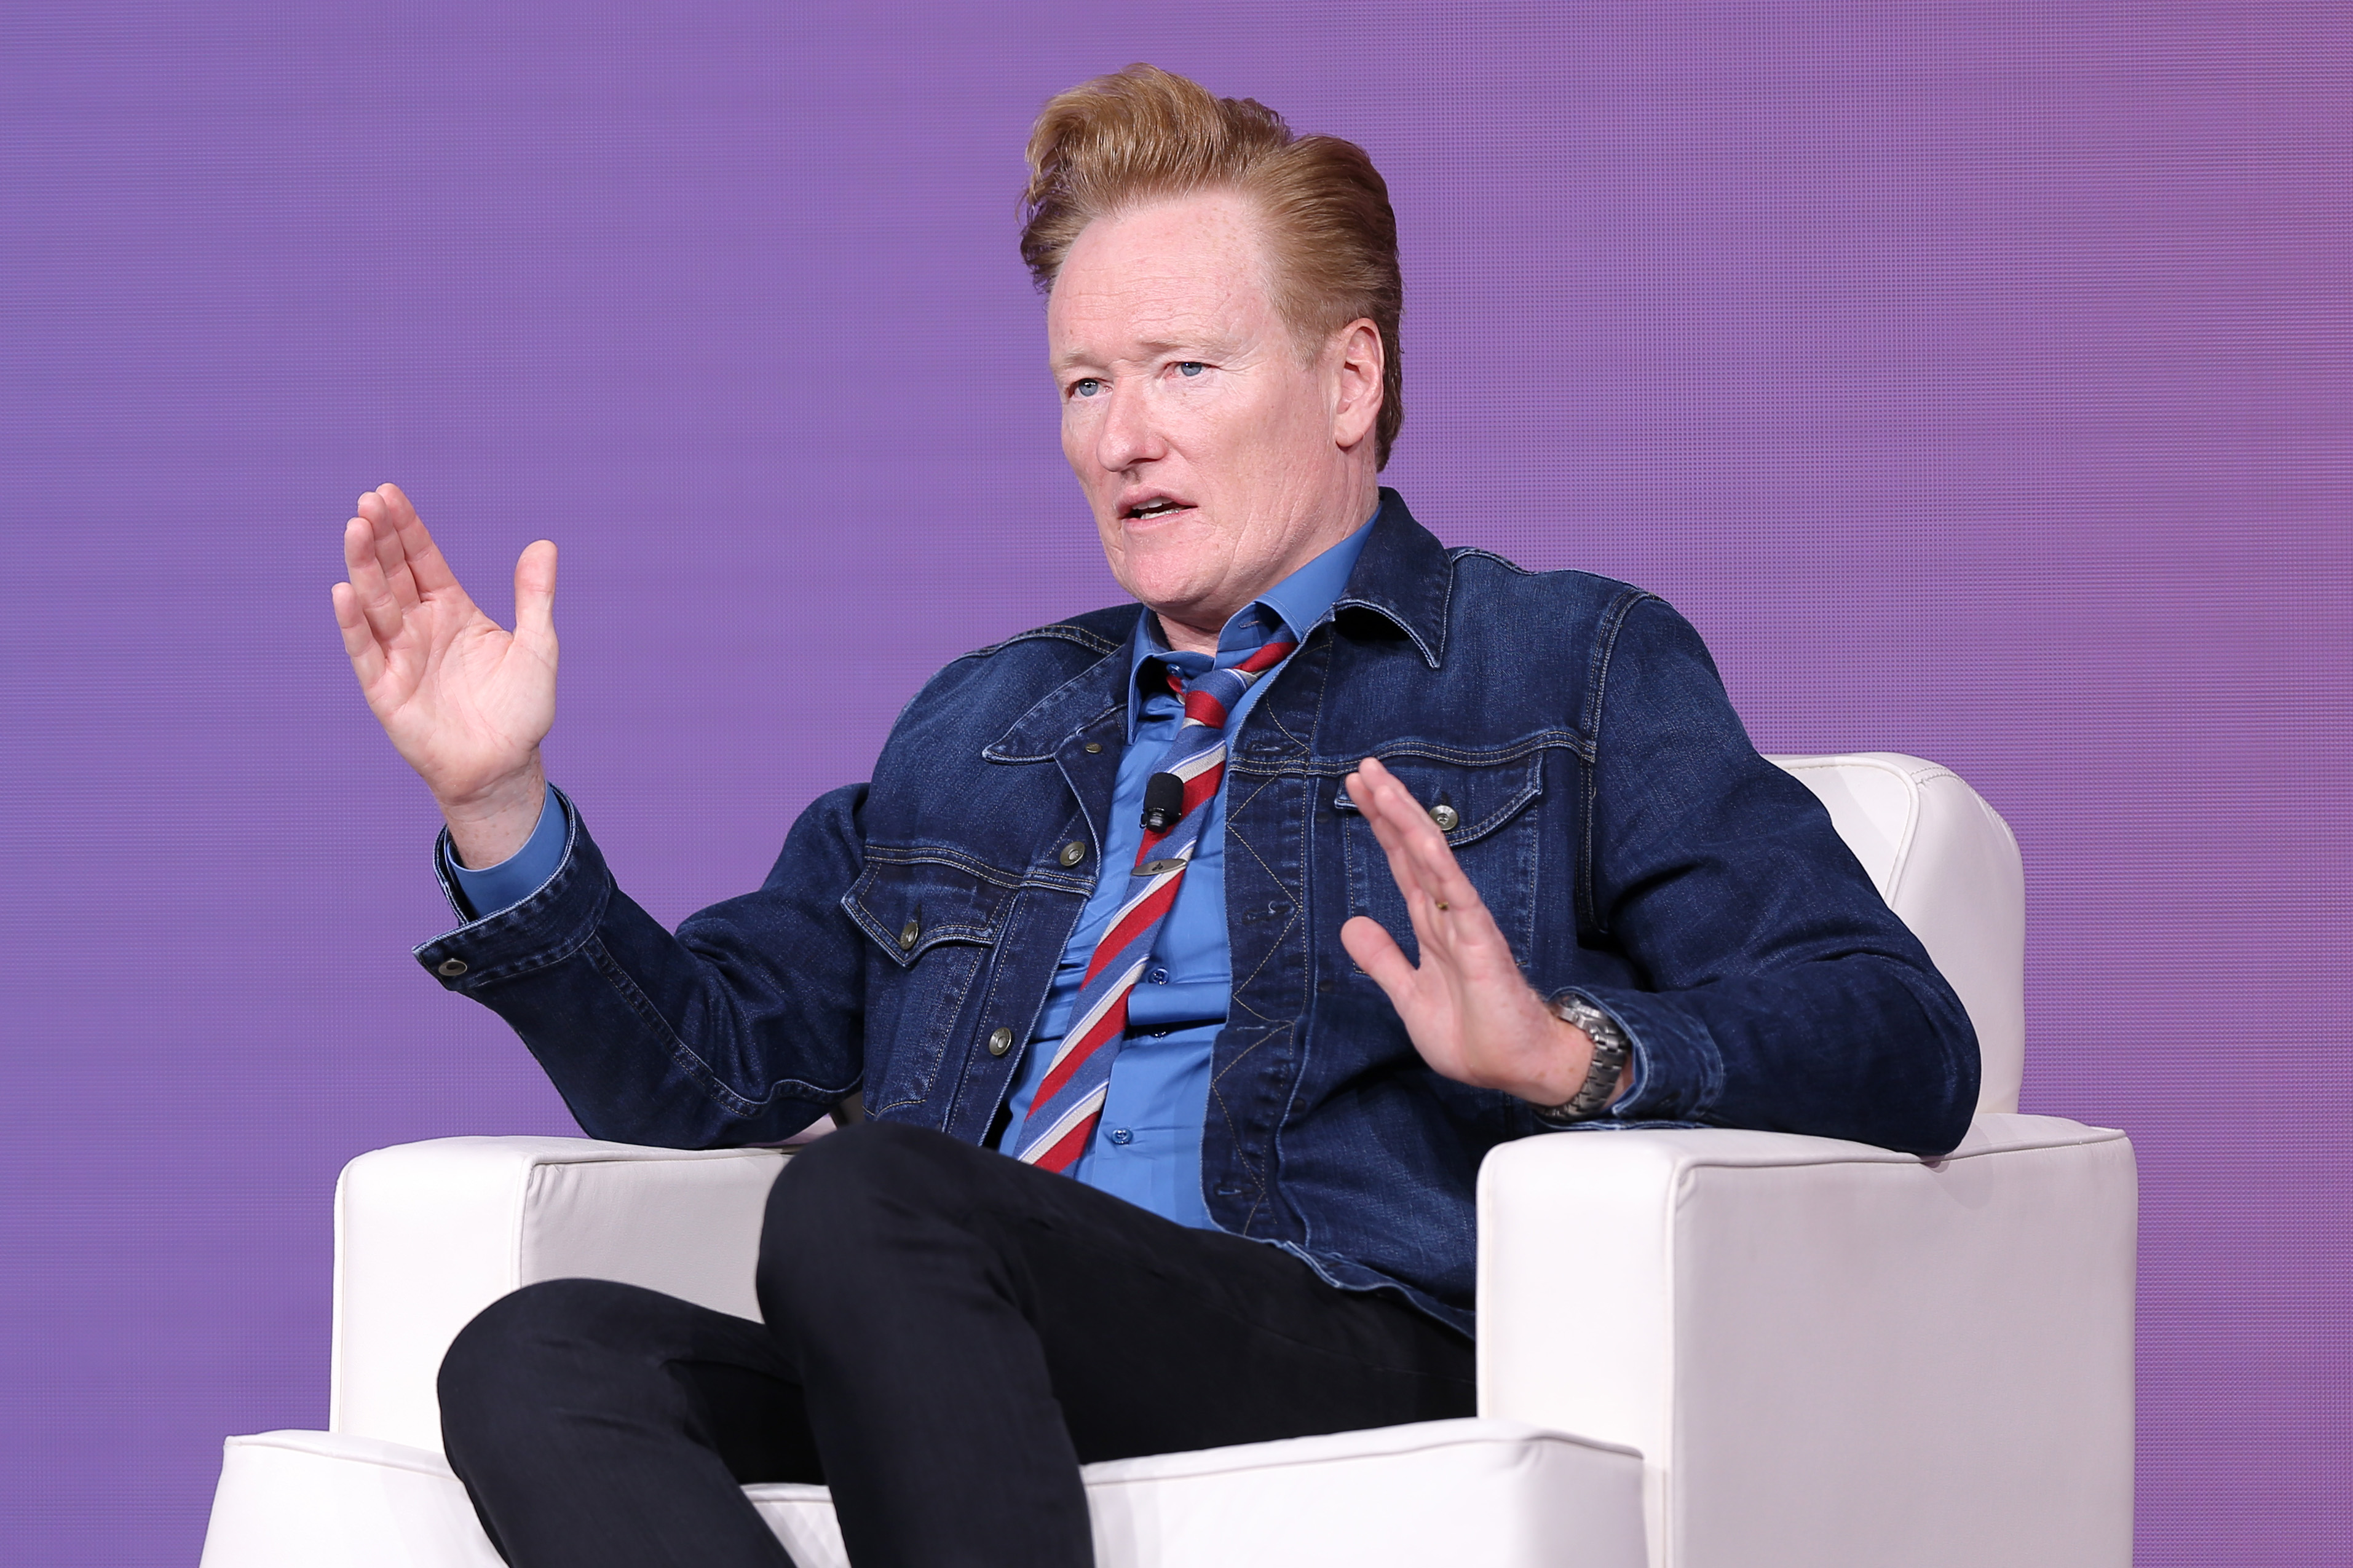 Laptops, other equipment stolen from Conan O'Brien's talk show set